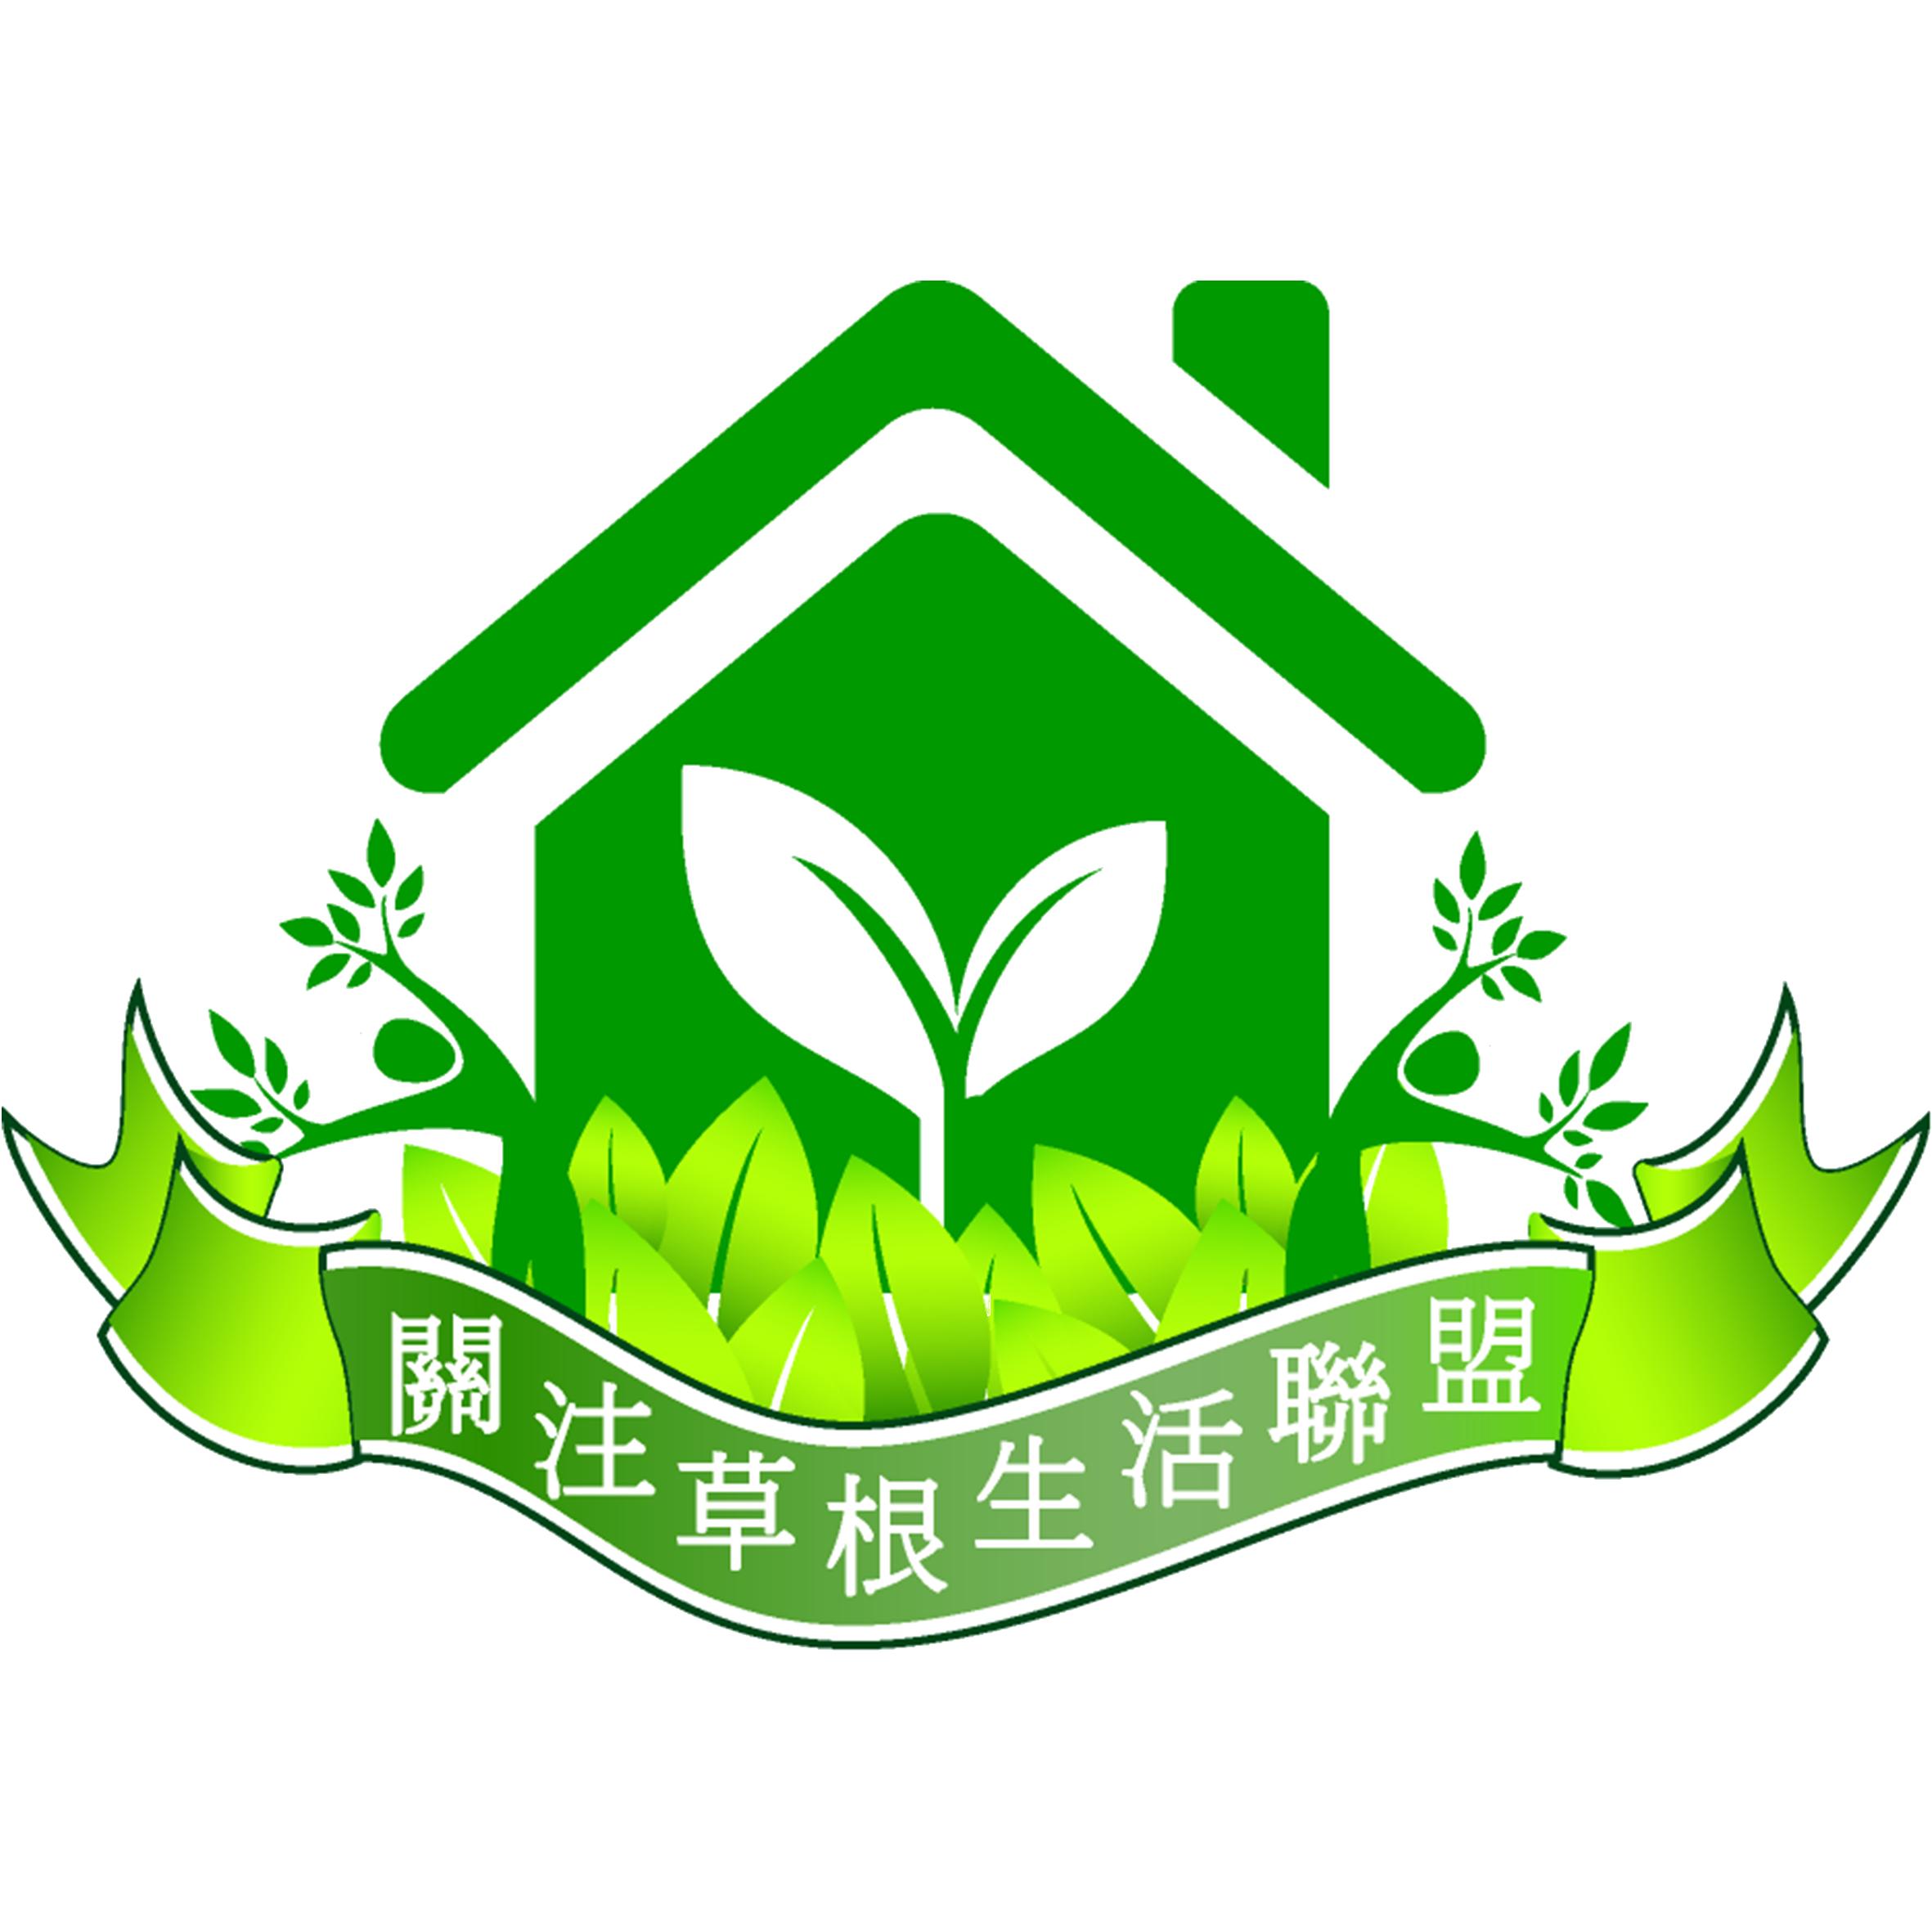 CONCERN FOR GRASSROOTS\' LIVELIHOOD ALLIANCE LIMITED